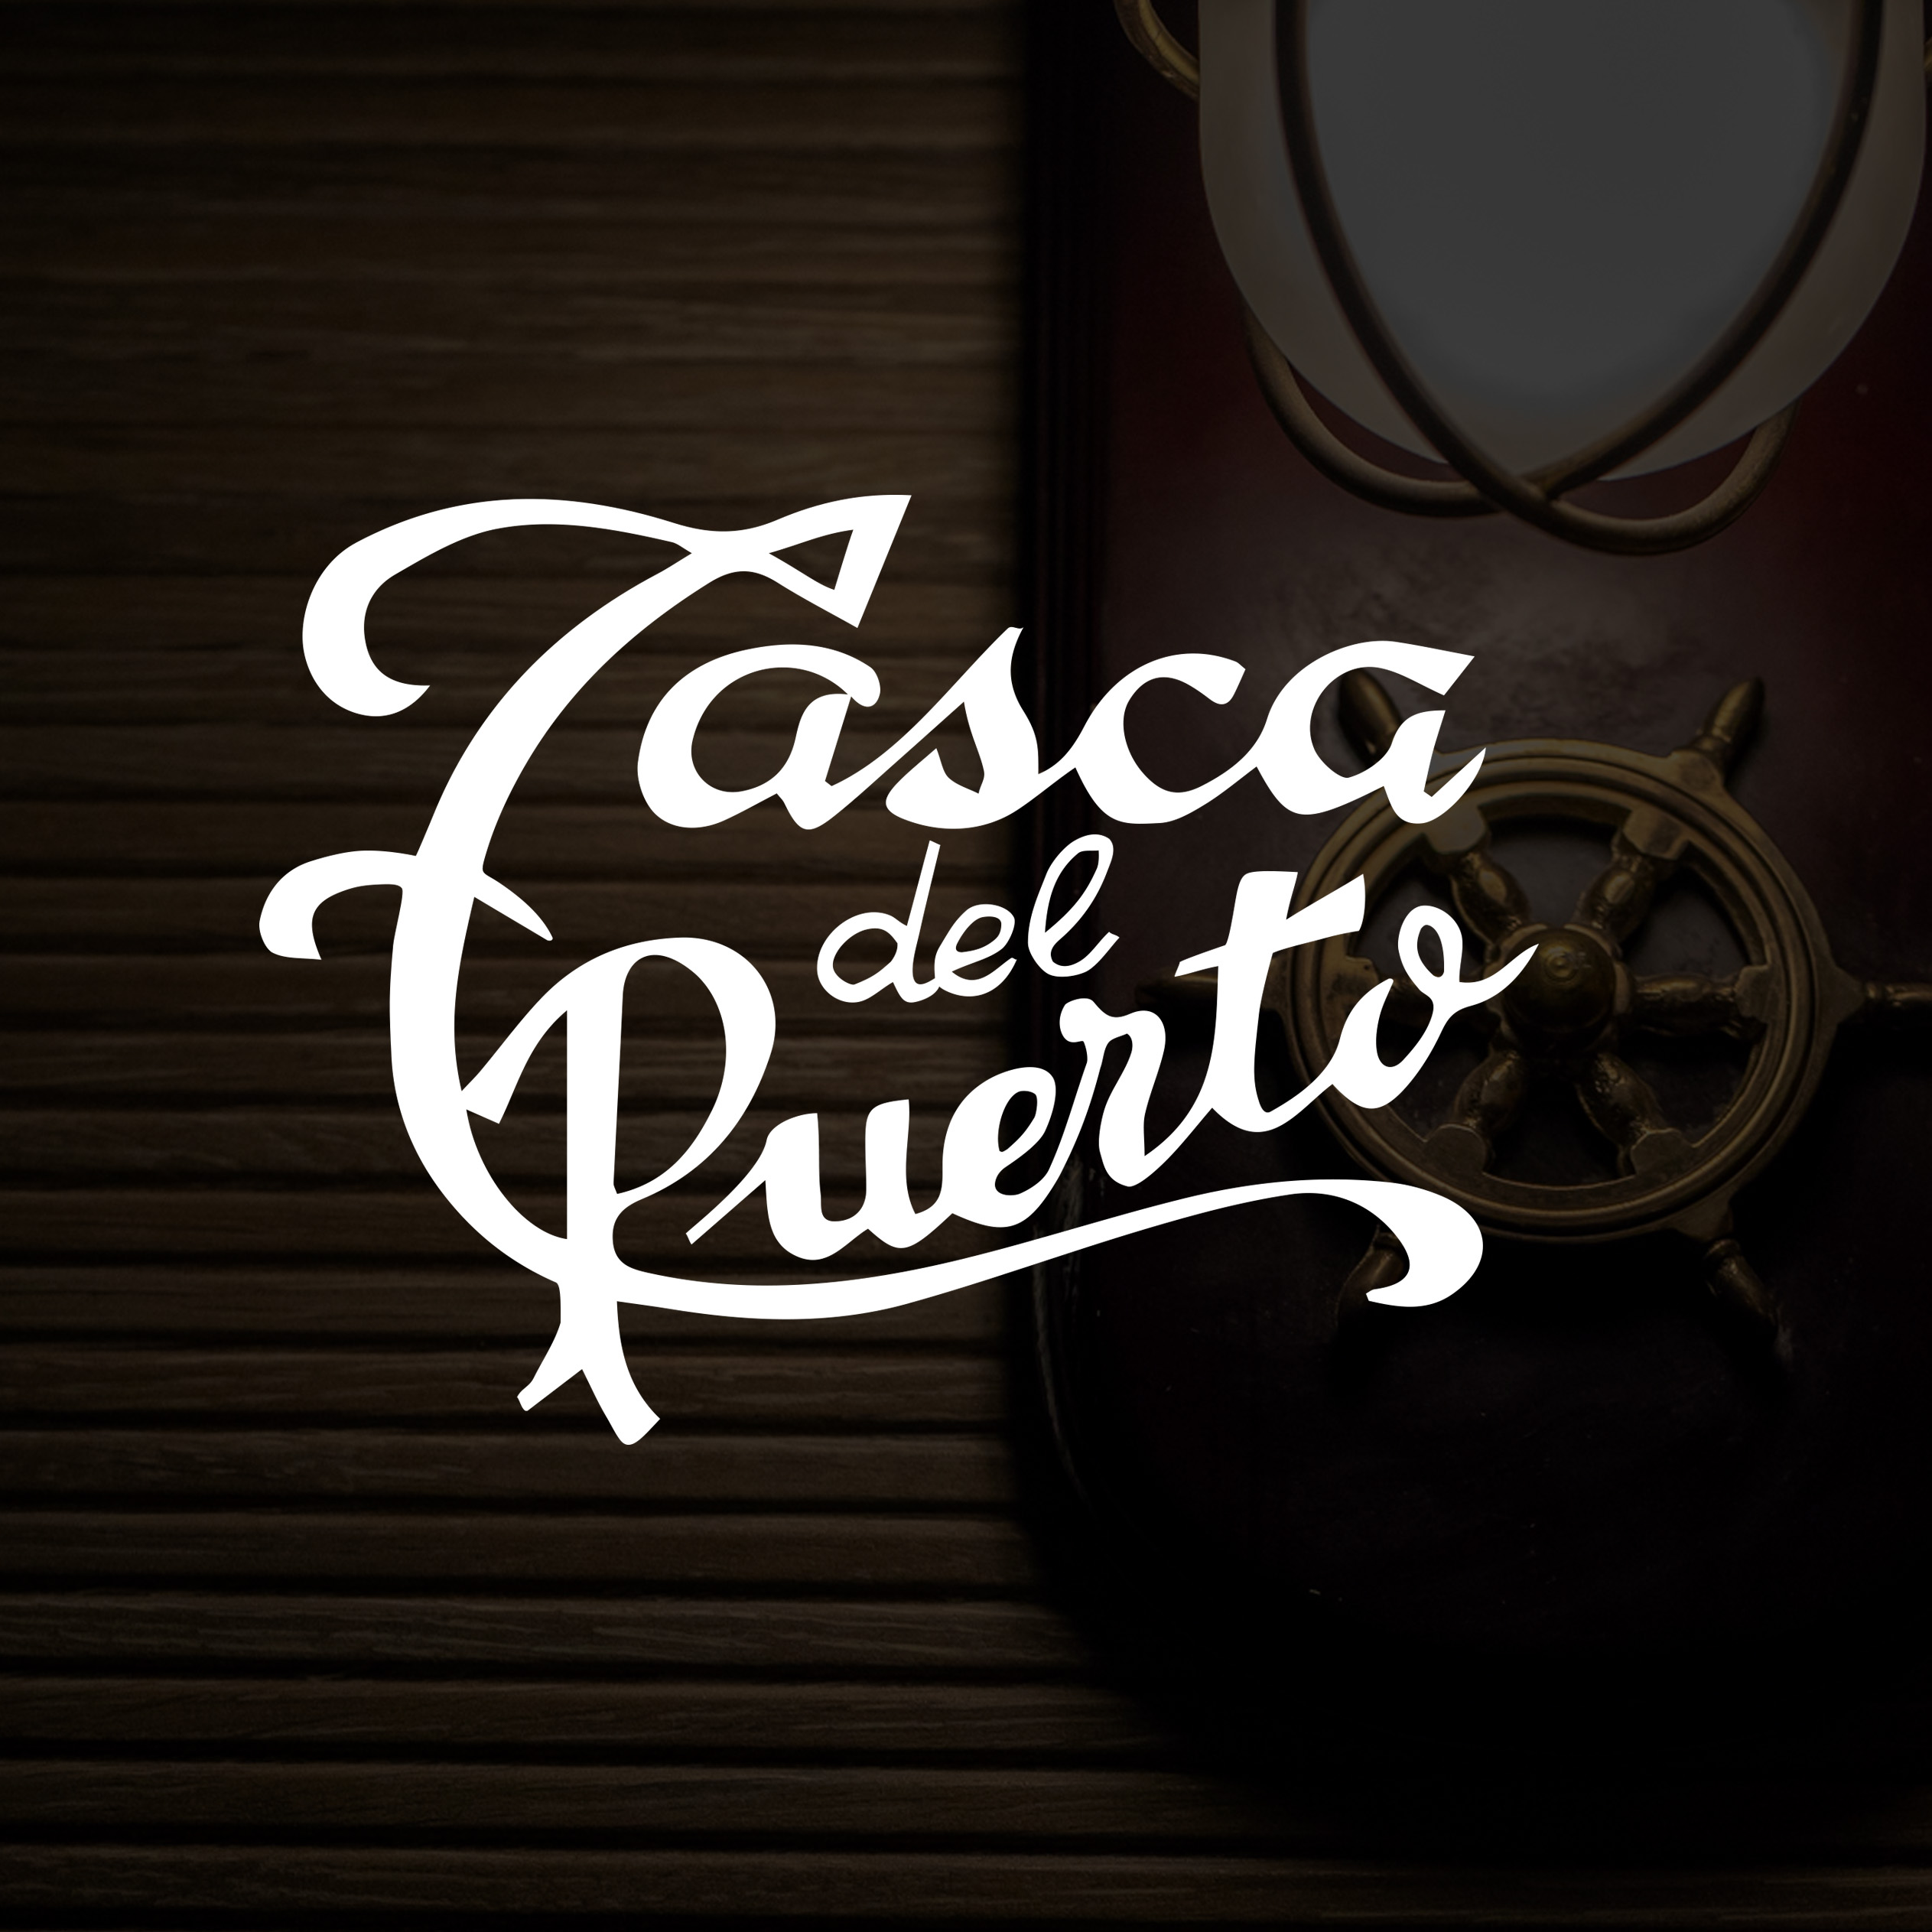 Tasca del Puerto